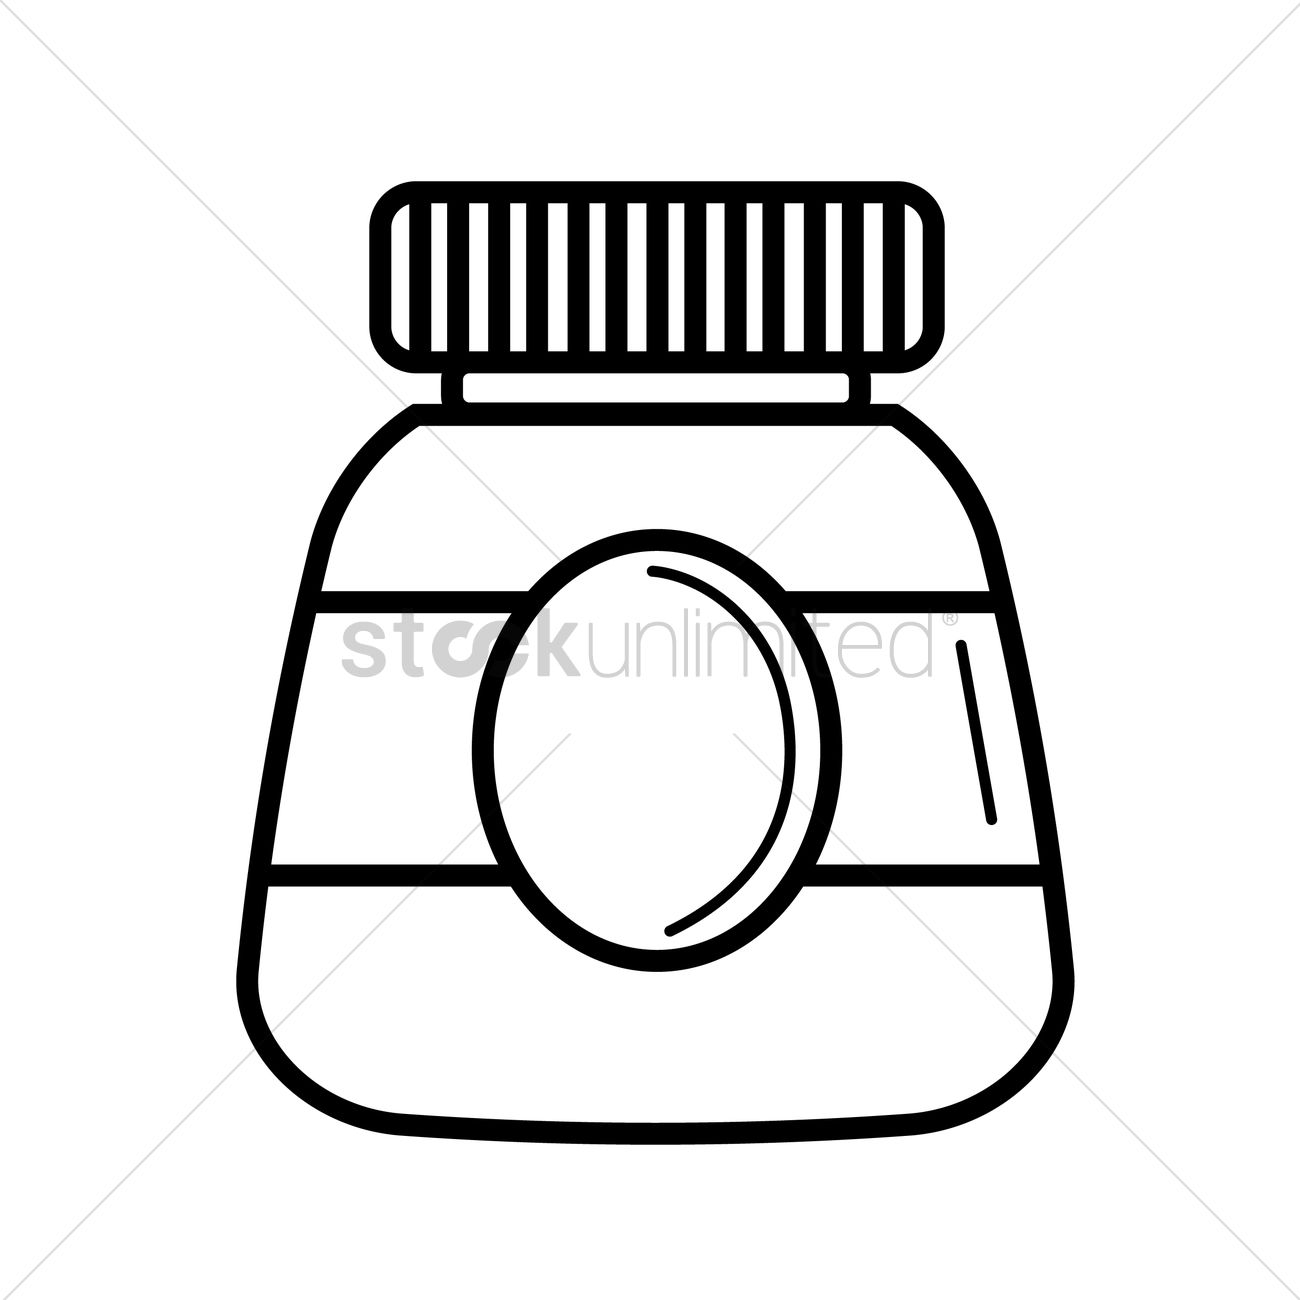 Free Gum Bottle Vector Image